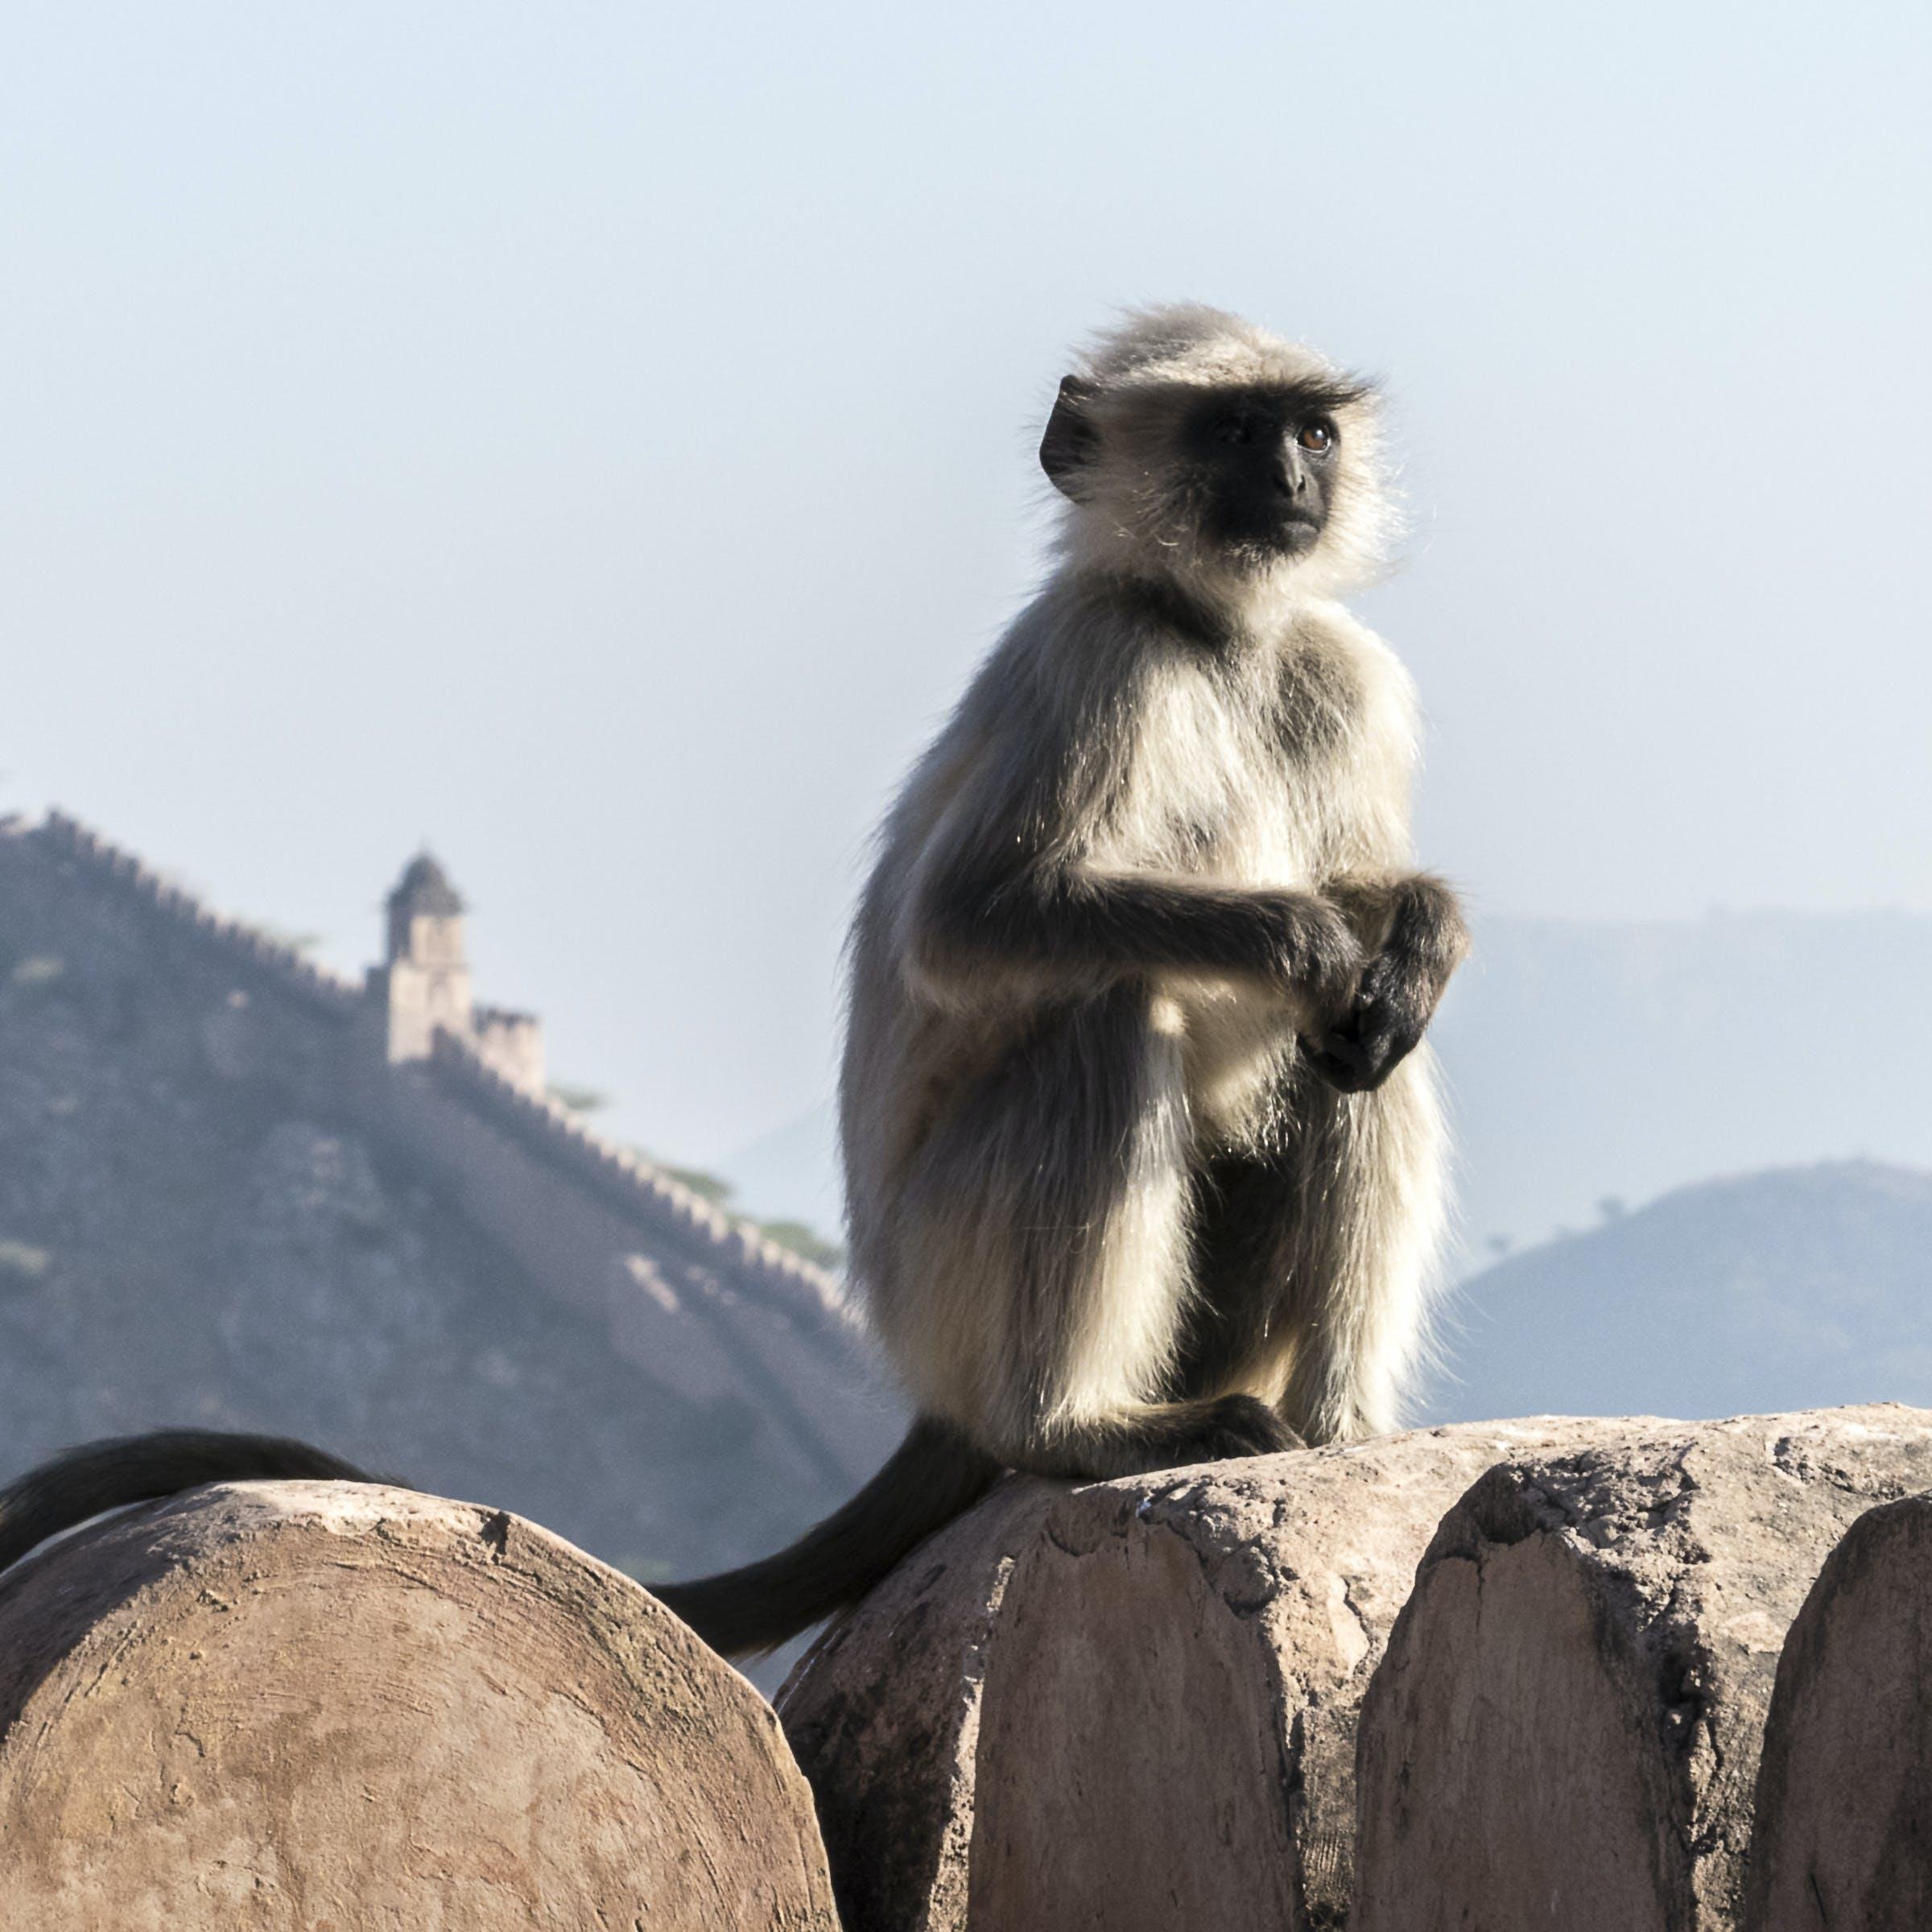 Gratis lagerfoto af abe, bymuren